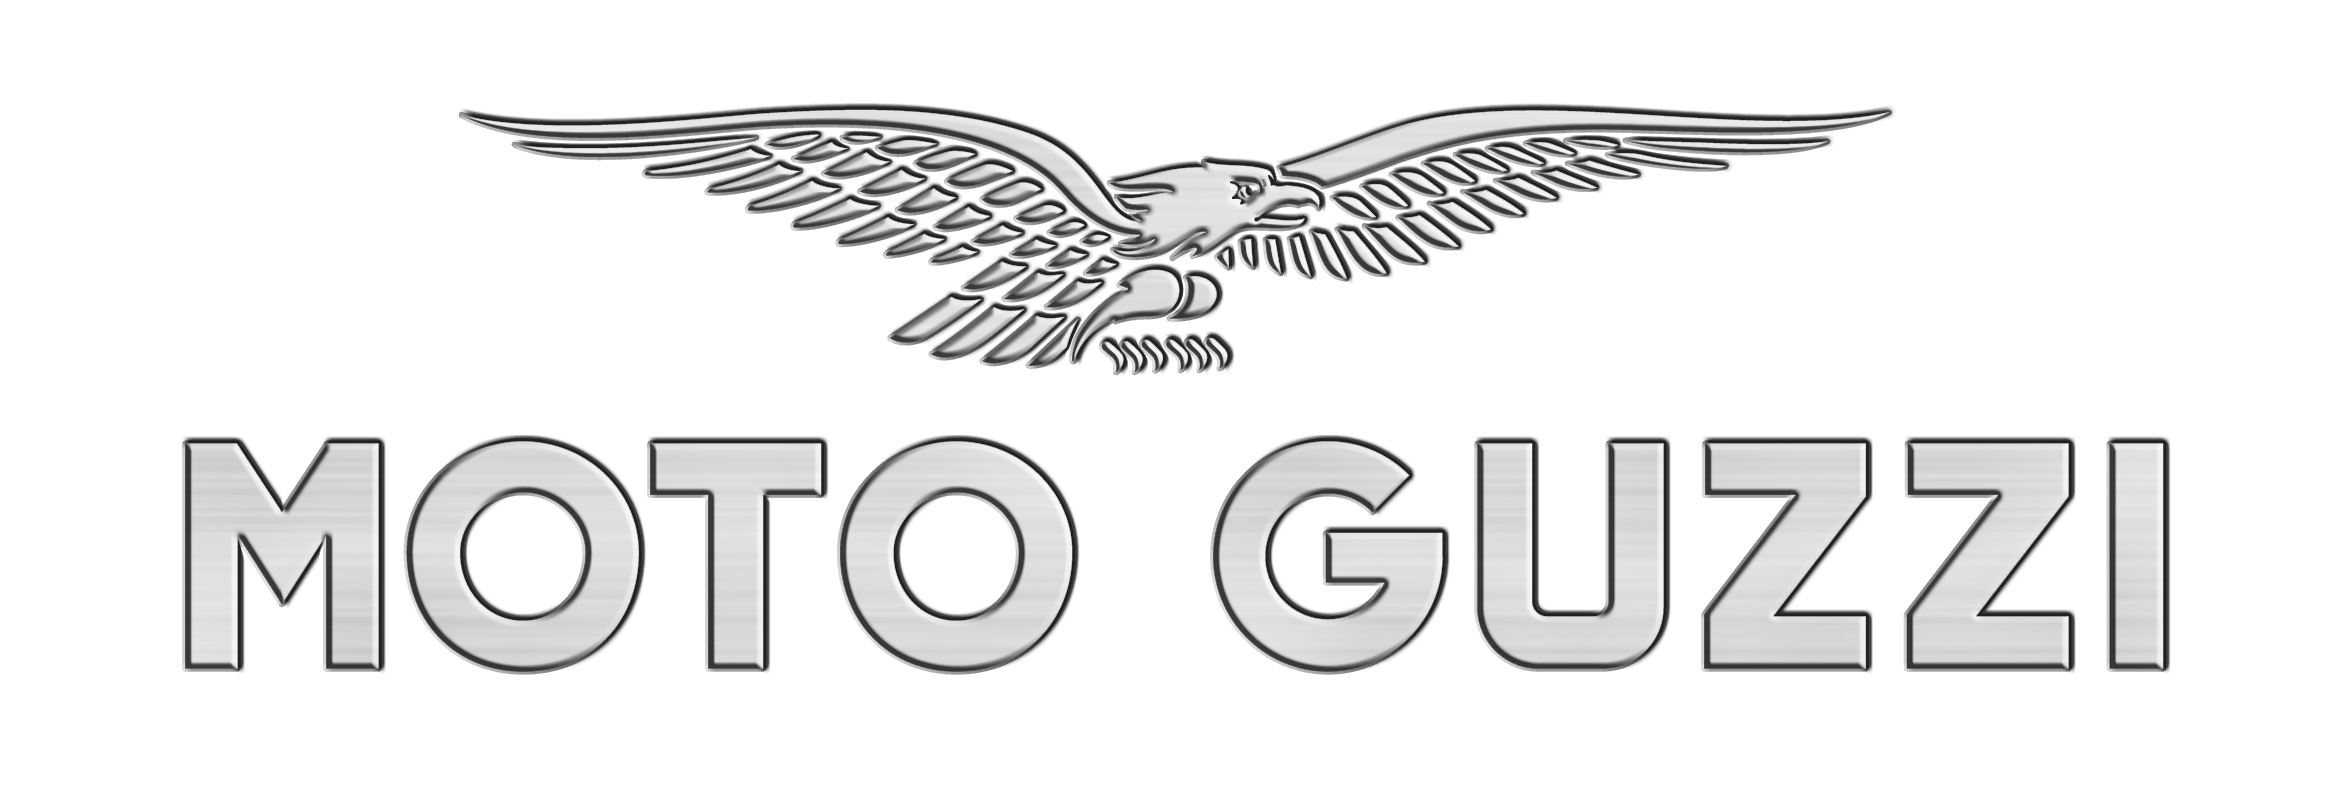 Emblem Moto Guzzi